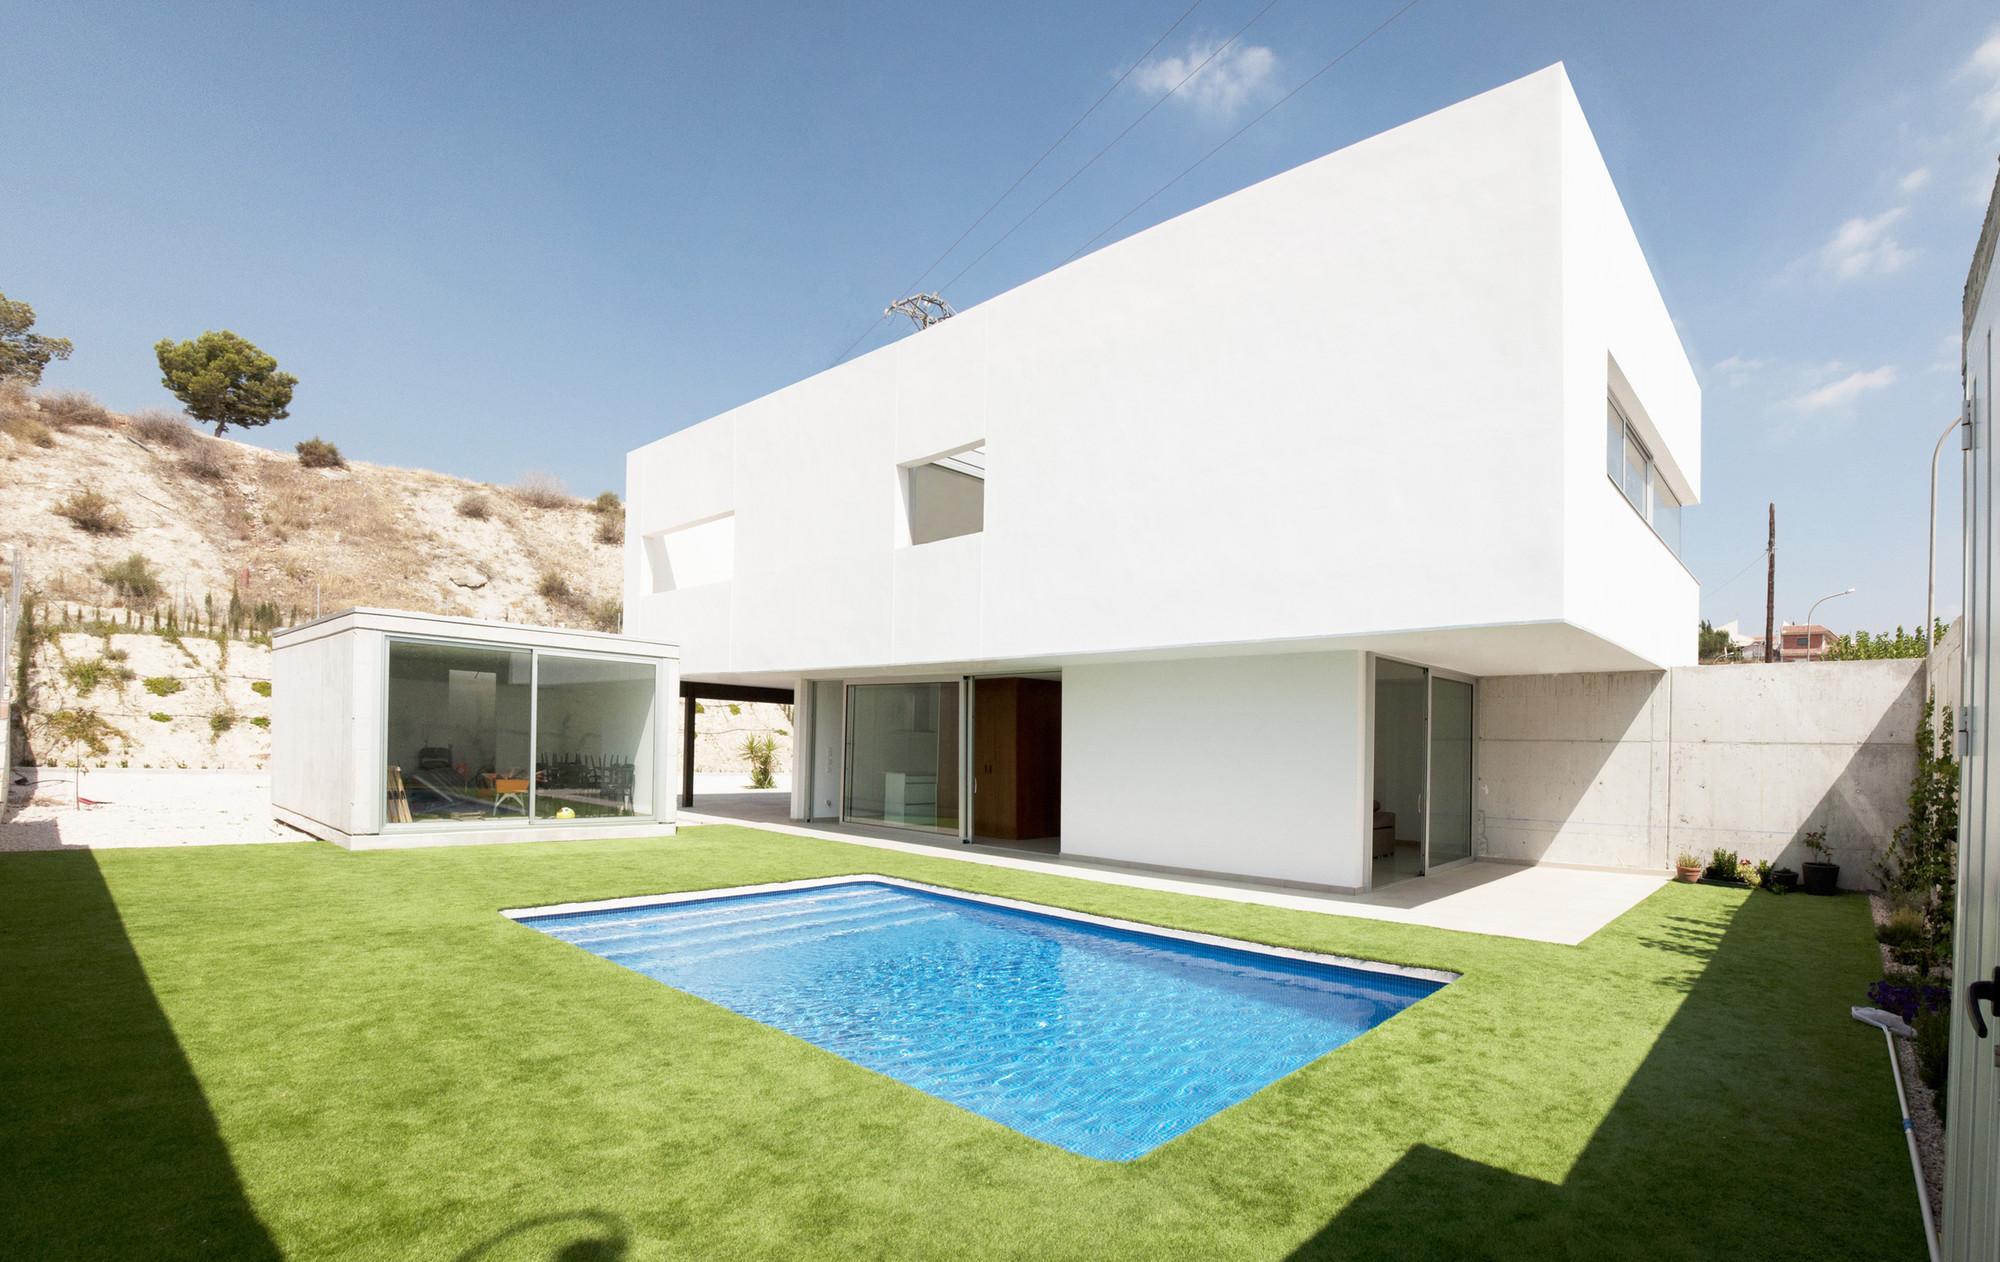 Casa a los pies de un barranco / La Mirateca, © Patricia Forcen Scheu